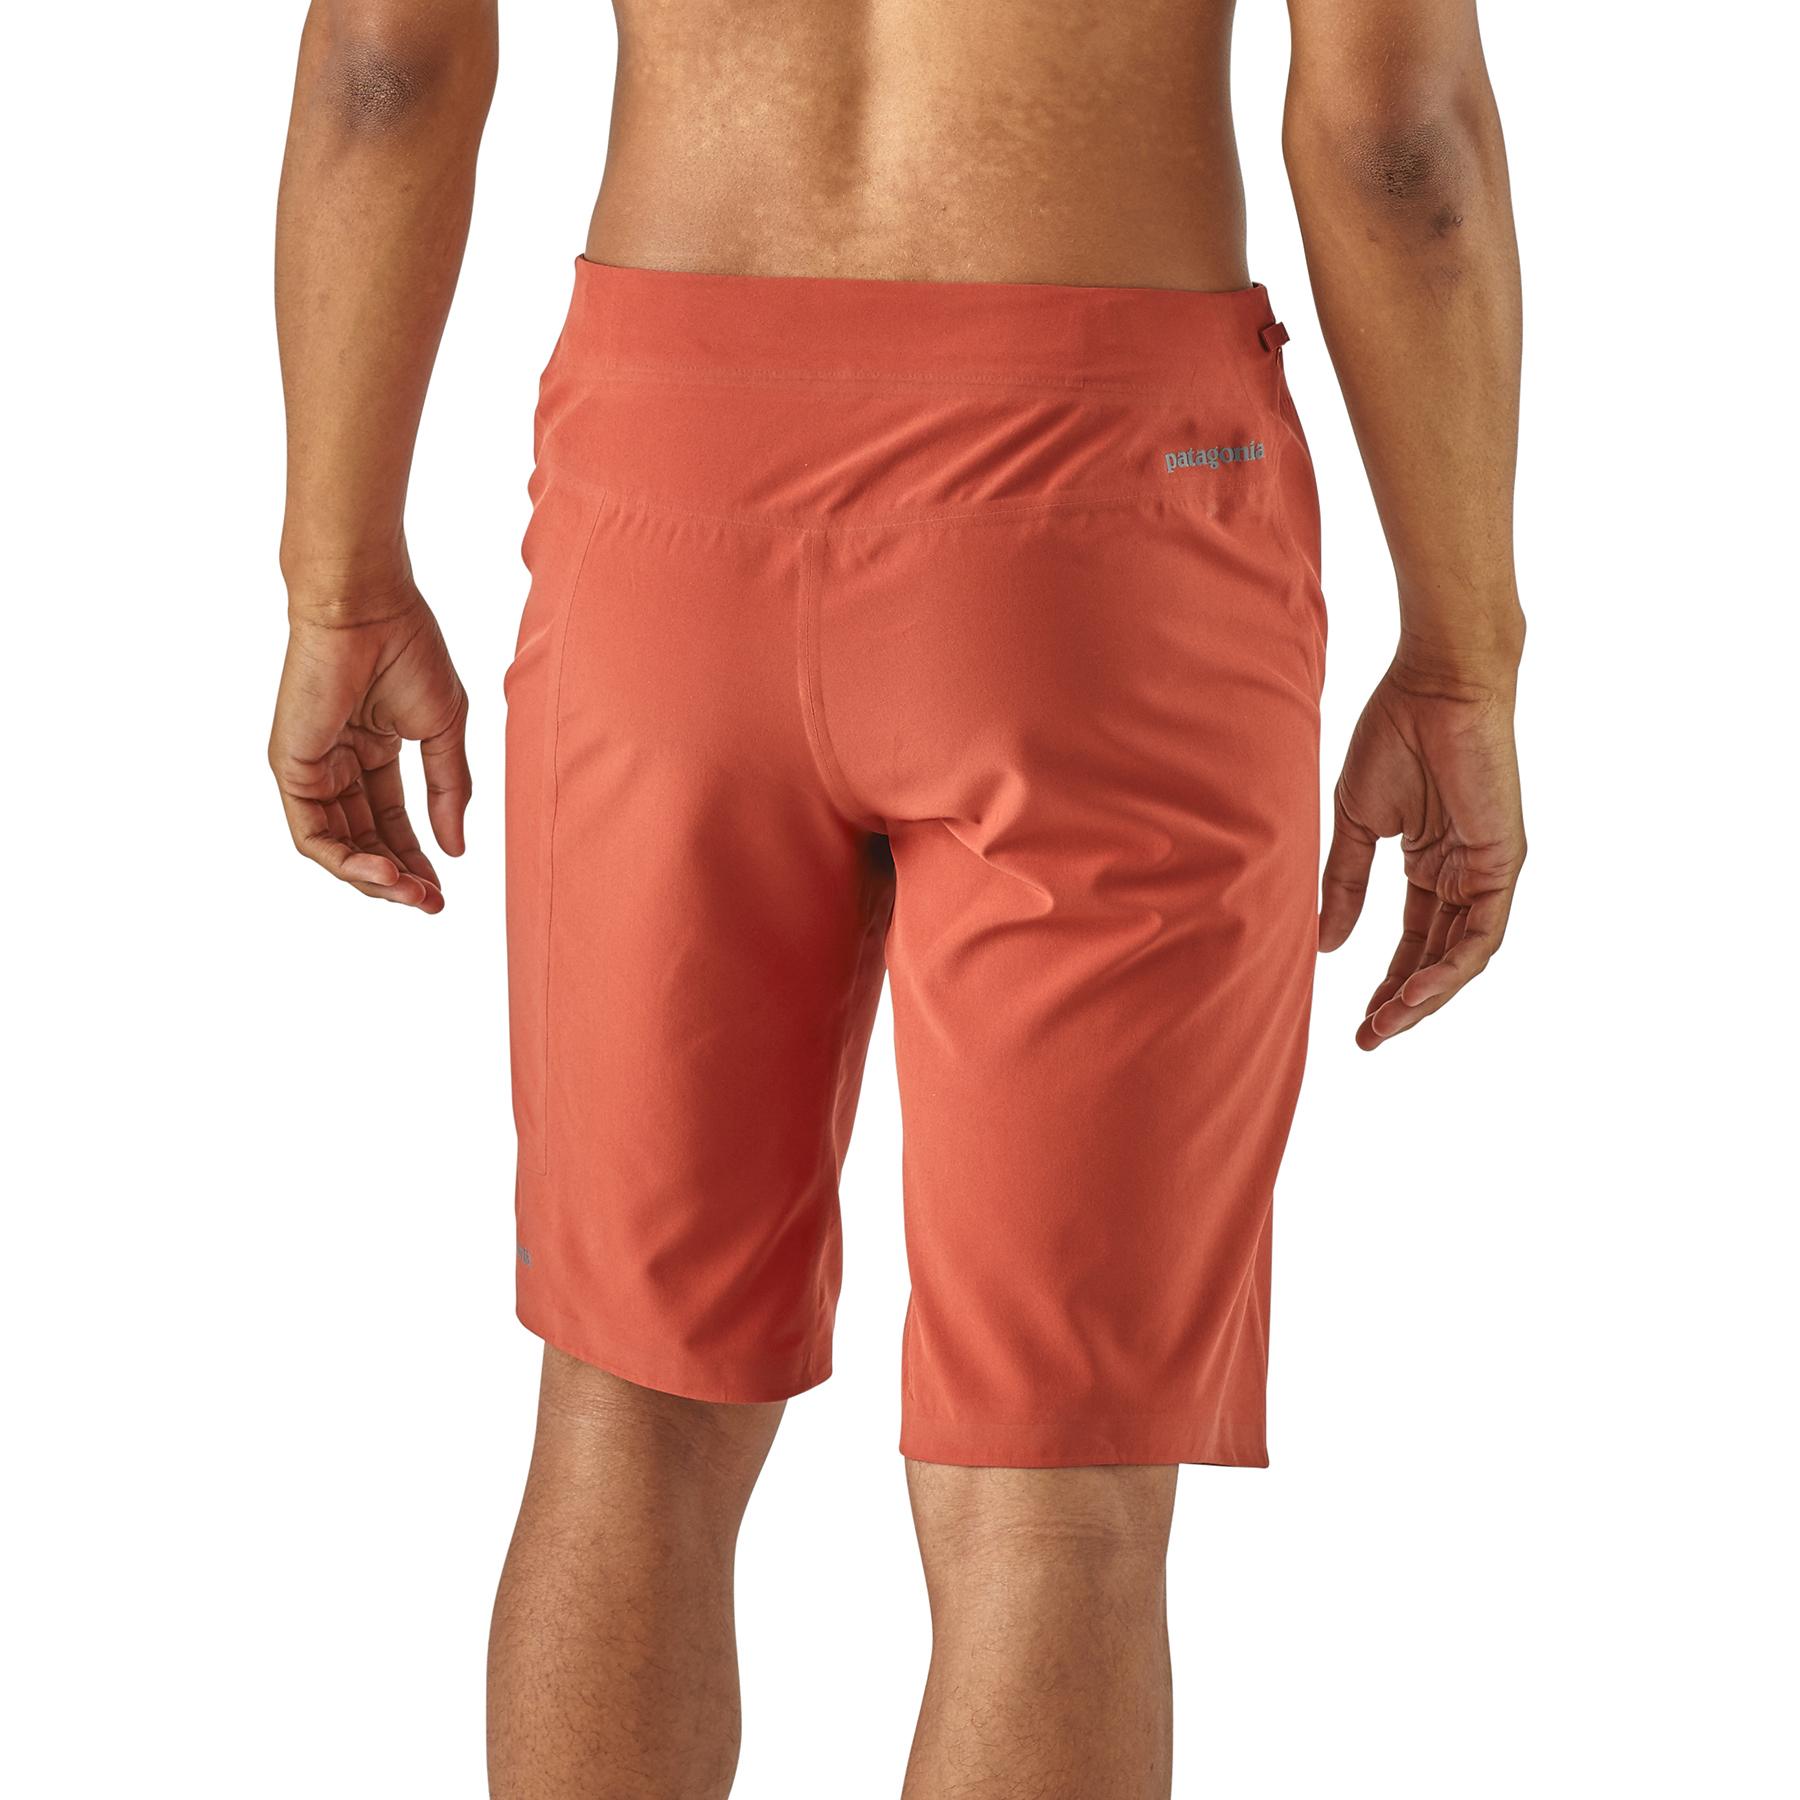 a4ff20eb555 Patagonia Dirt Roamer Bike Shorts - Men s